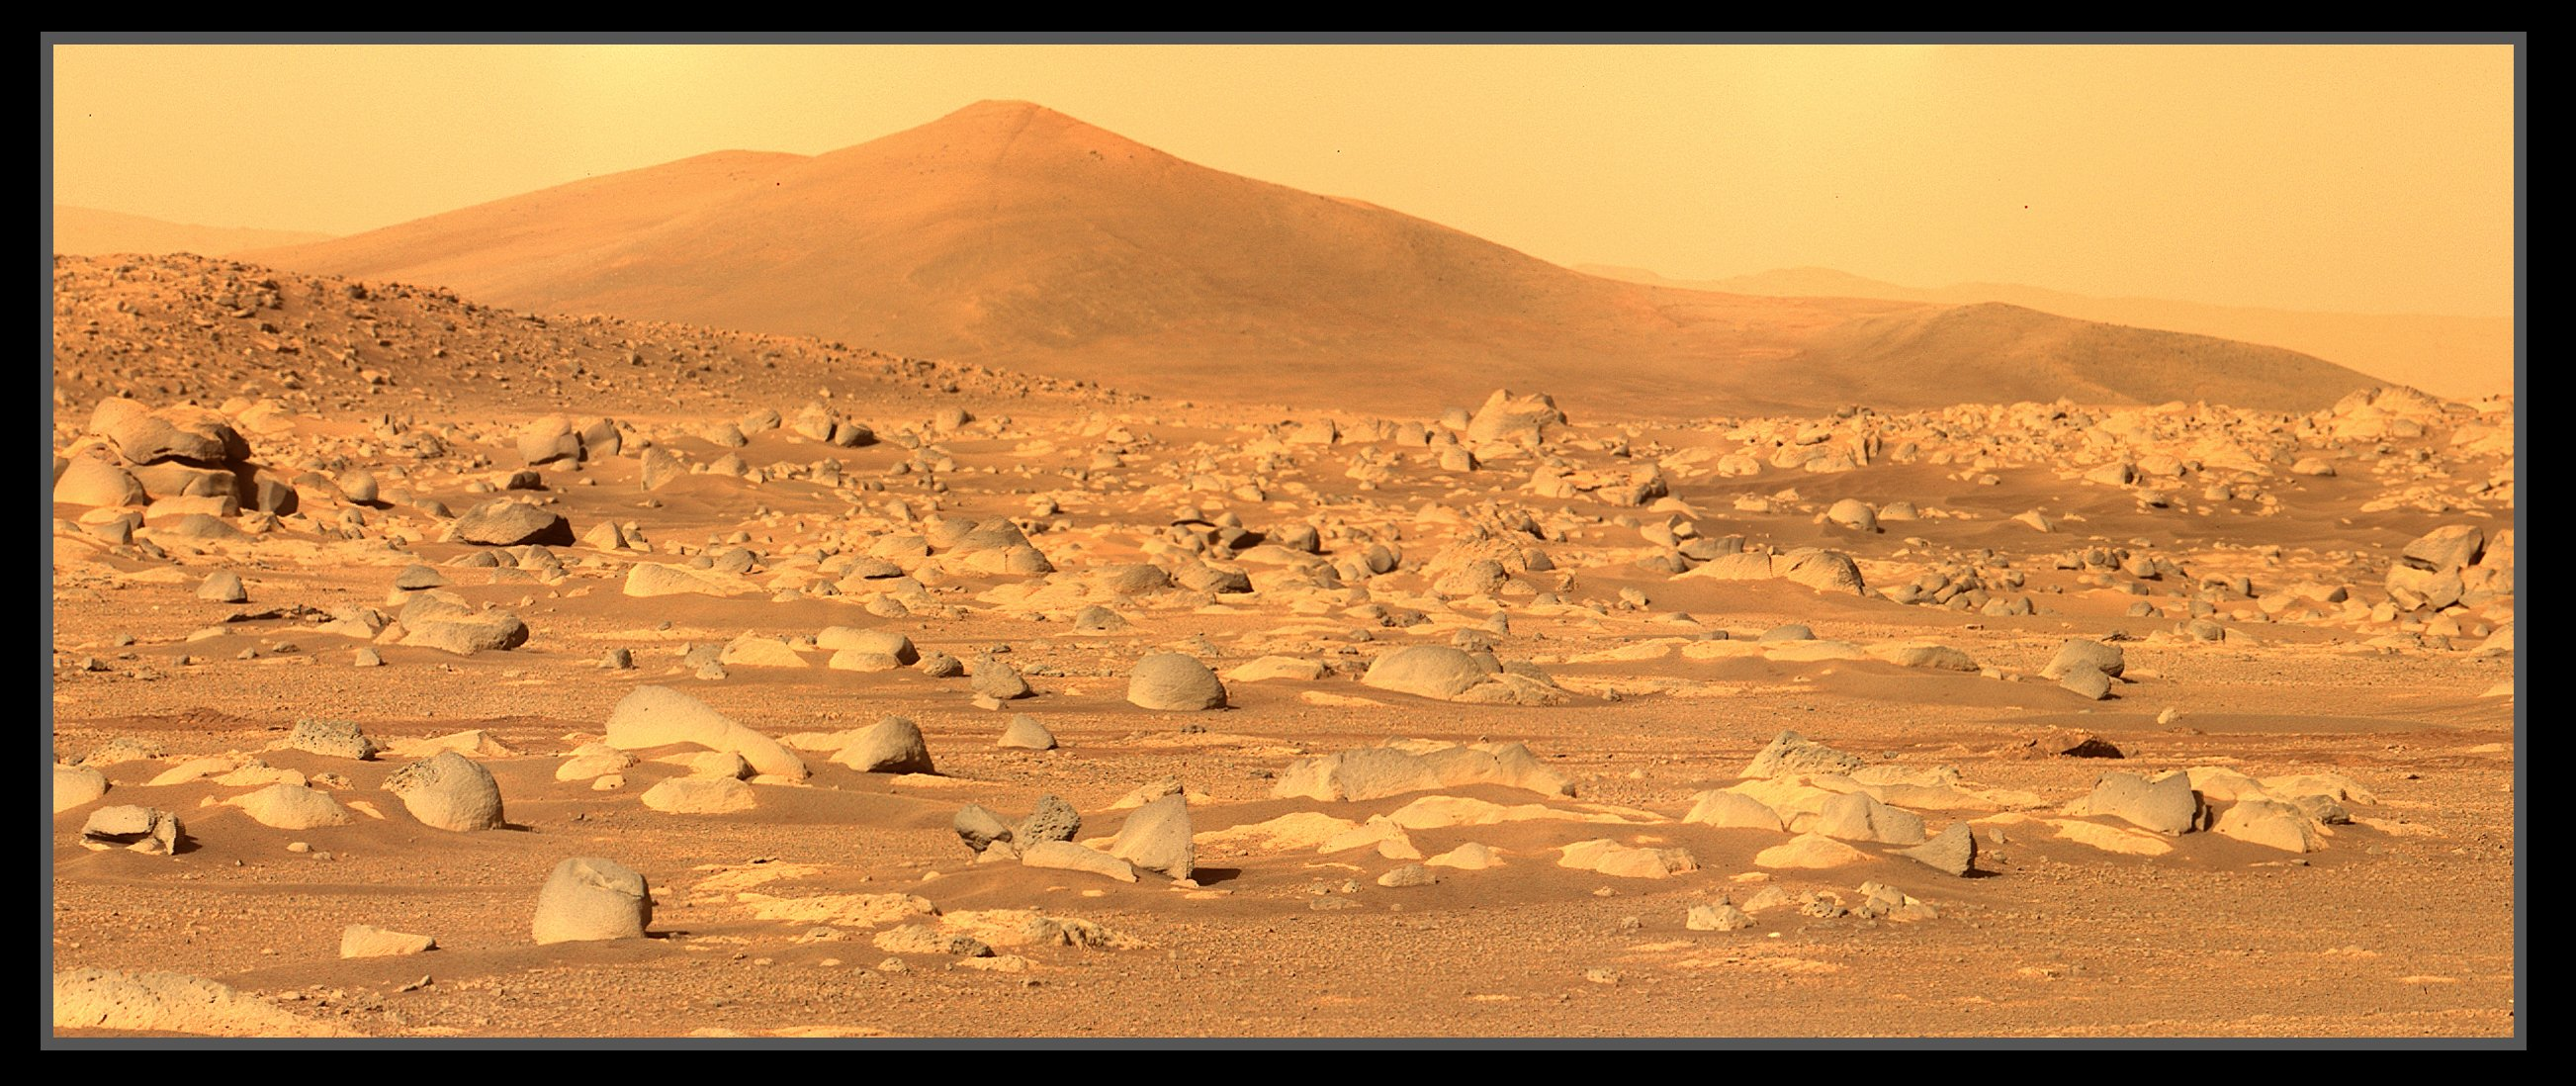 Mars 2020 (Perseverance) : exploration du cratère Jezero - Page 7 EyAB338XMAA_0G7?format=jpg&name=4096x4096